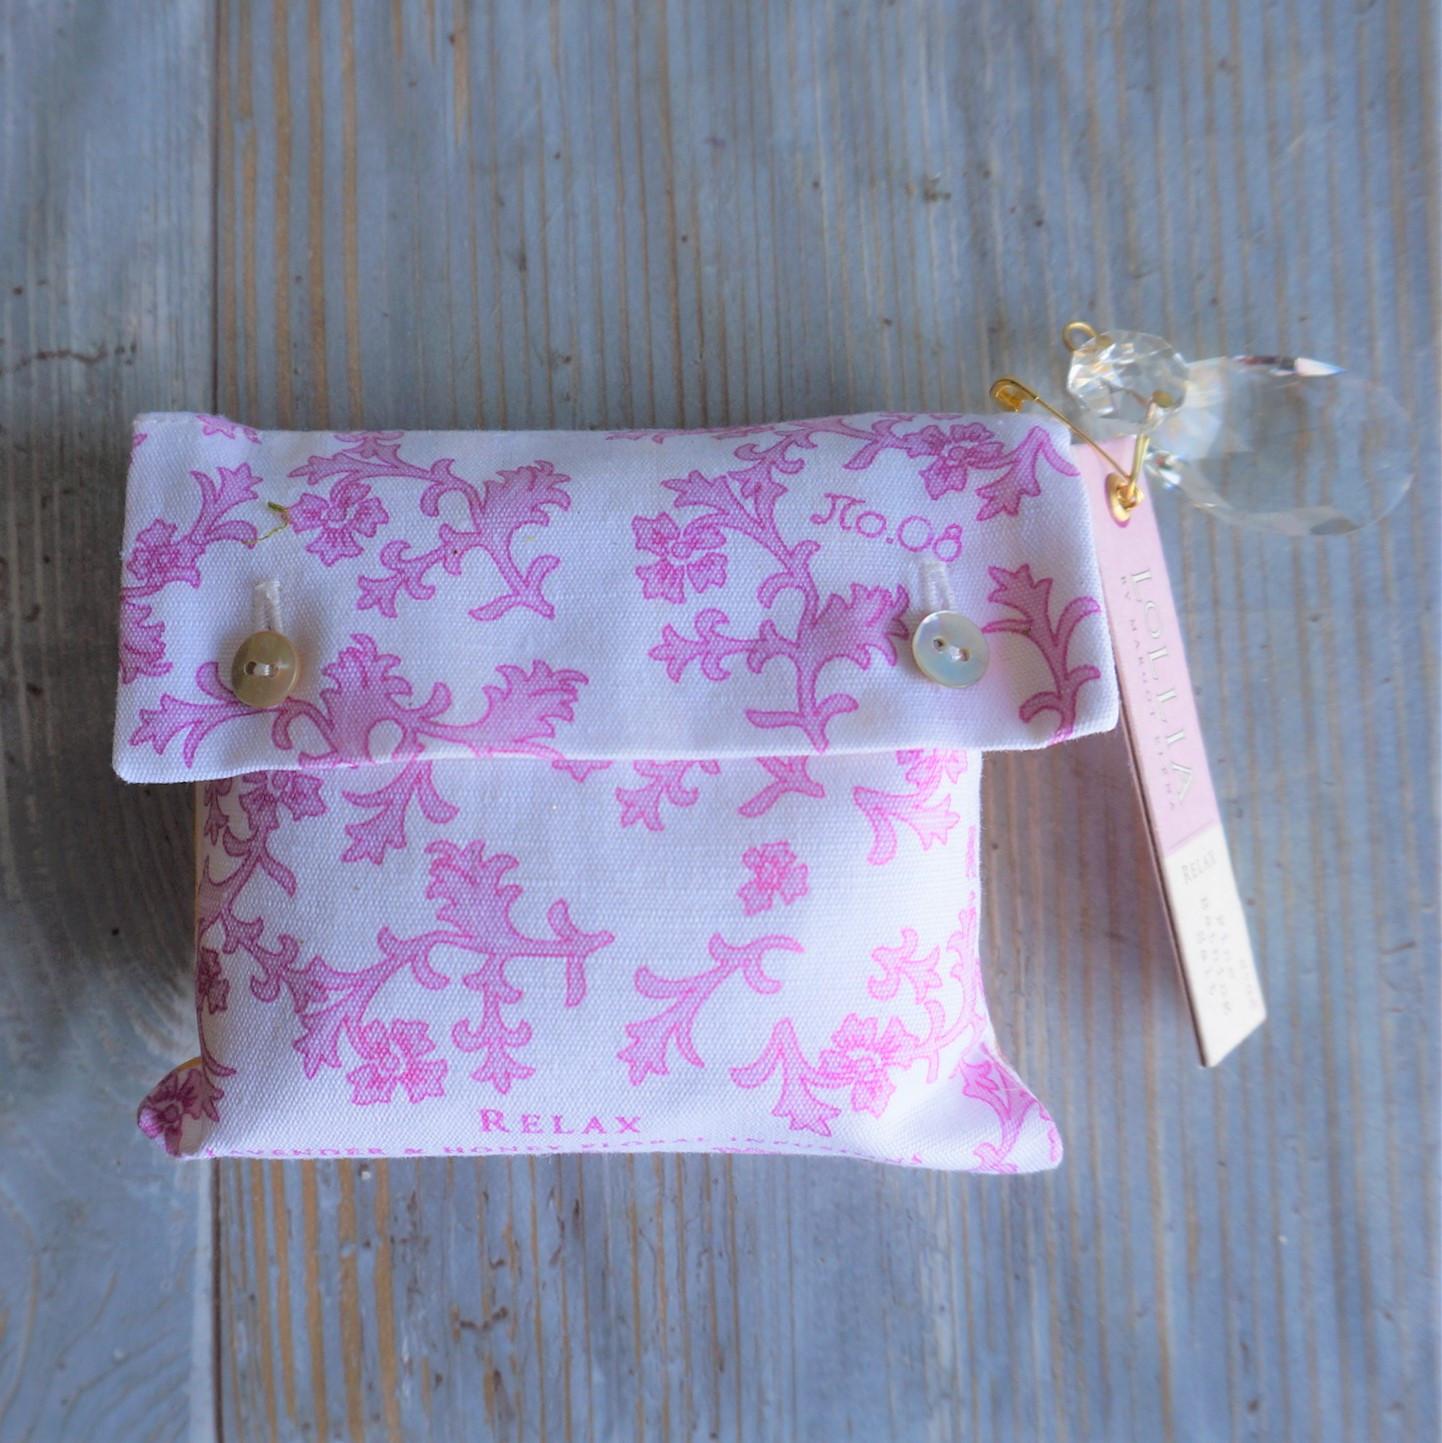 Lollia Bath Salt